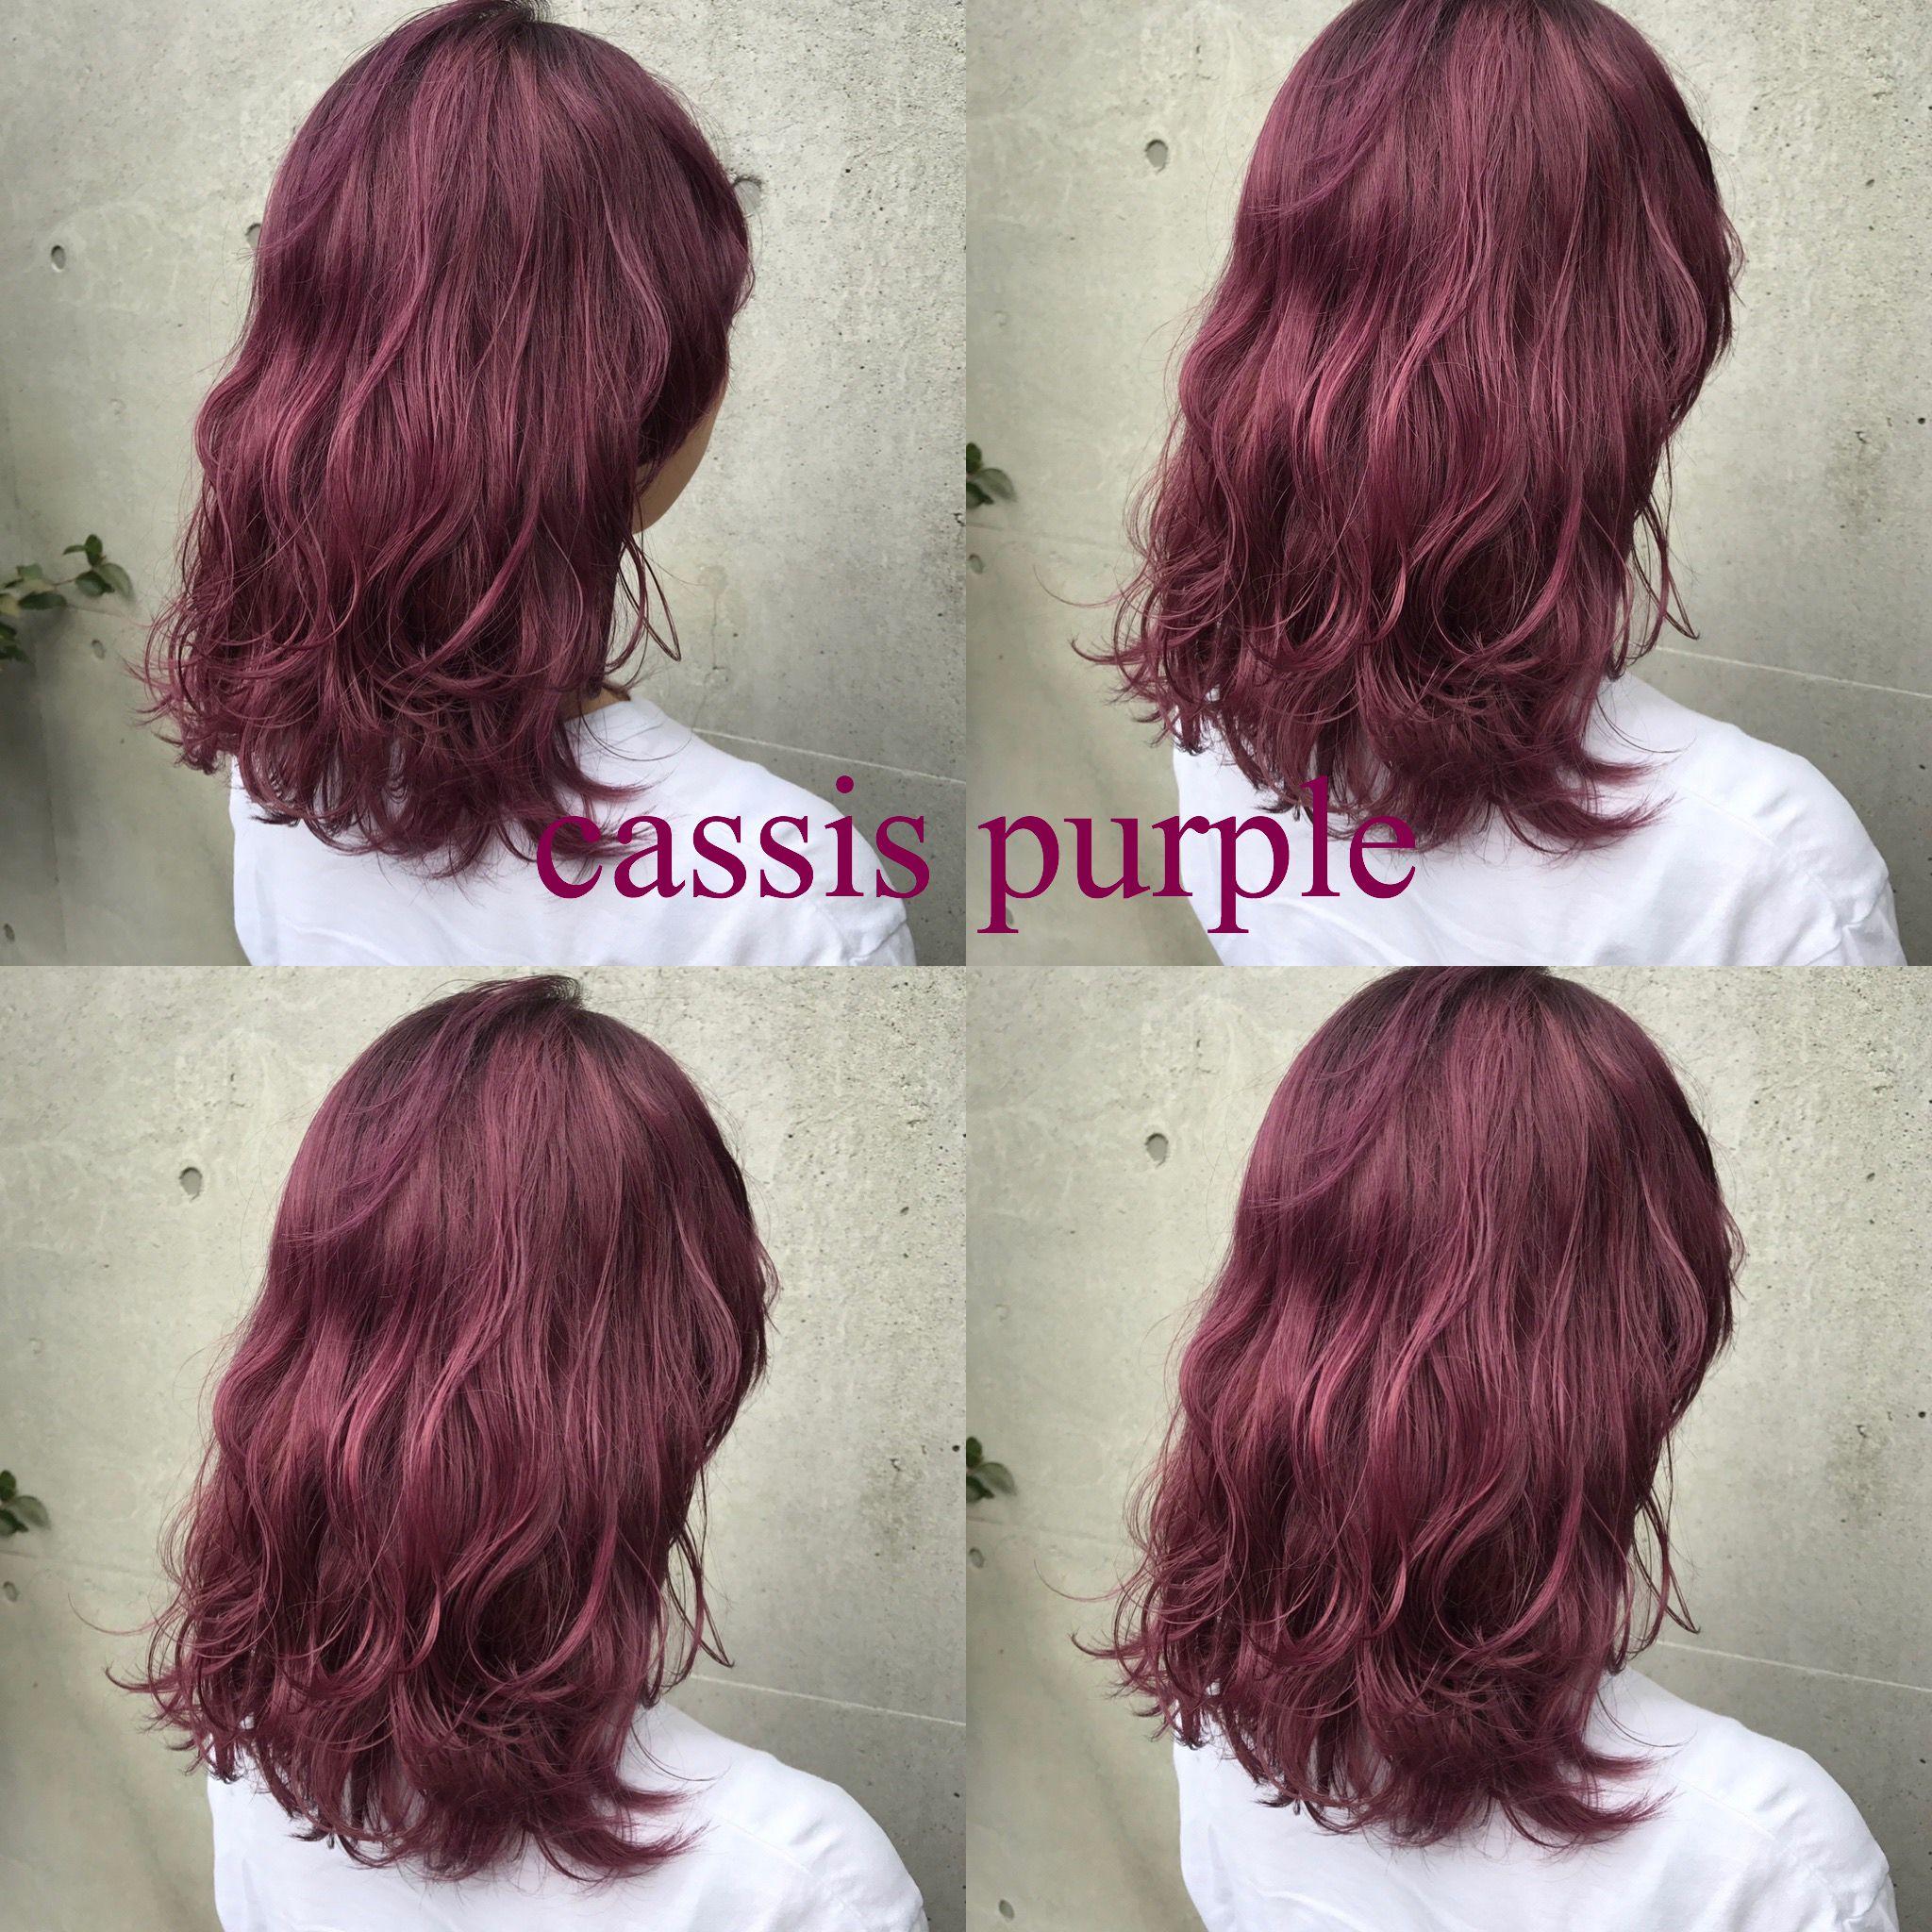 Flowers矢野 Cassis Purple カシスカラー ボルドーカラー ピンクカラー 切りっぱなしボブ グレージュカラー インナーピンク オリーブベージュ ピンクベージュ ブリーチカラー